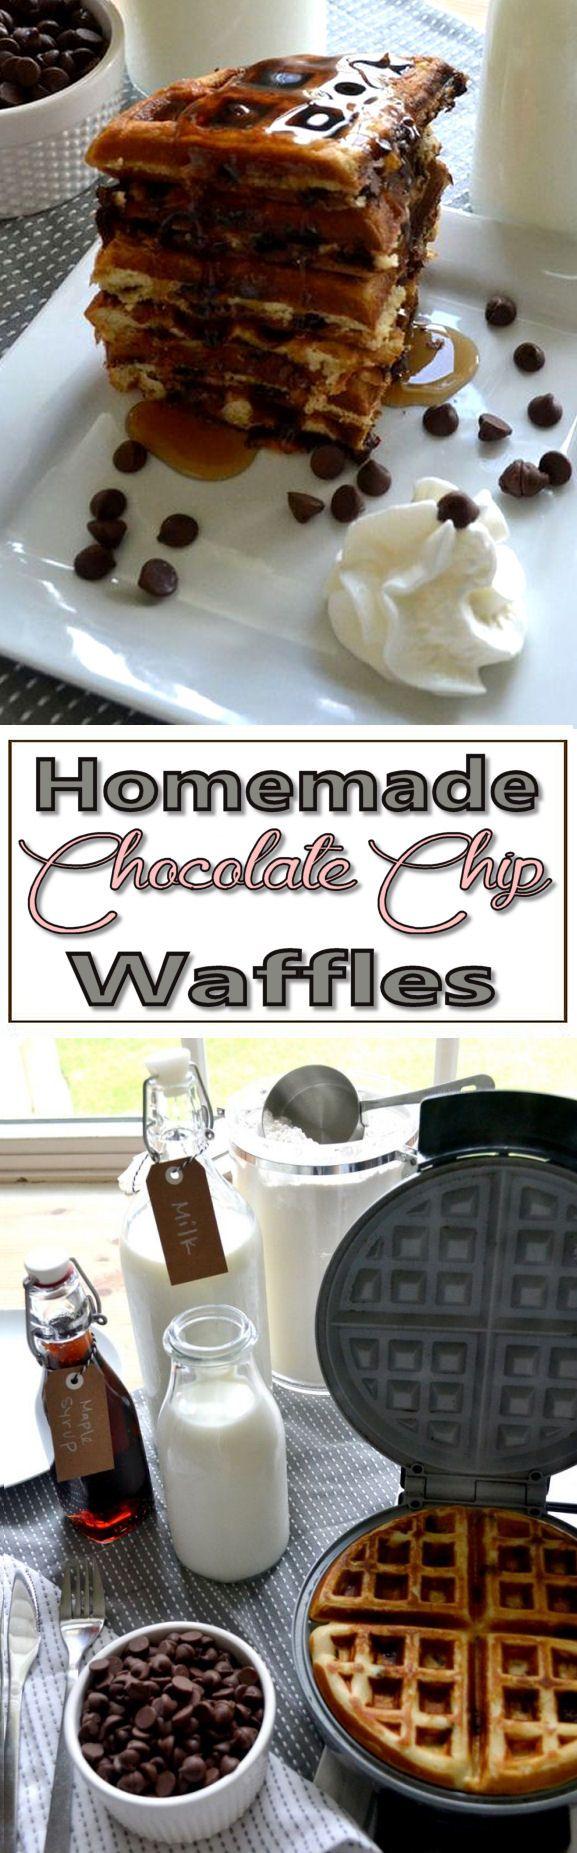 Homemade Chocolate Chip Waffles Recipe ❤︎ Yumm!  #breakfast #desert #brunch